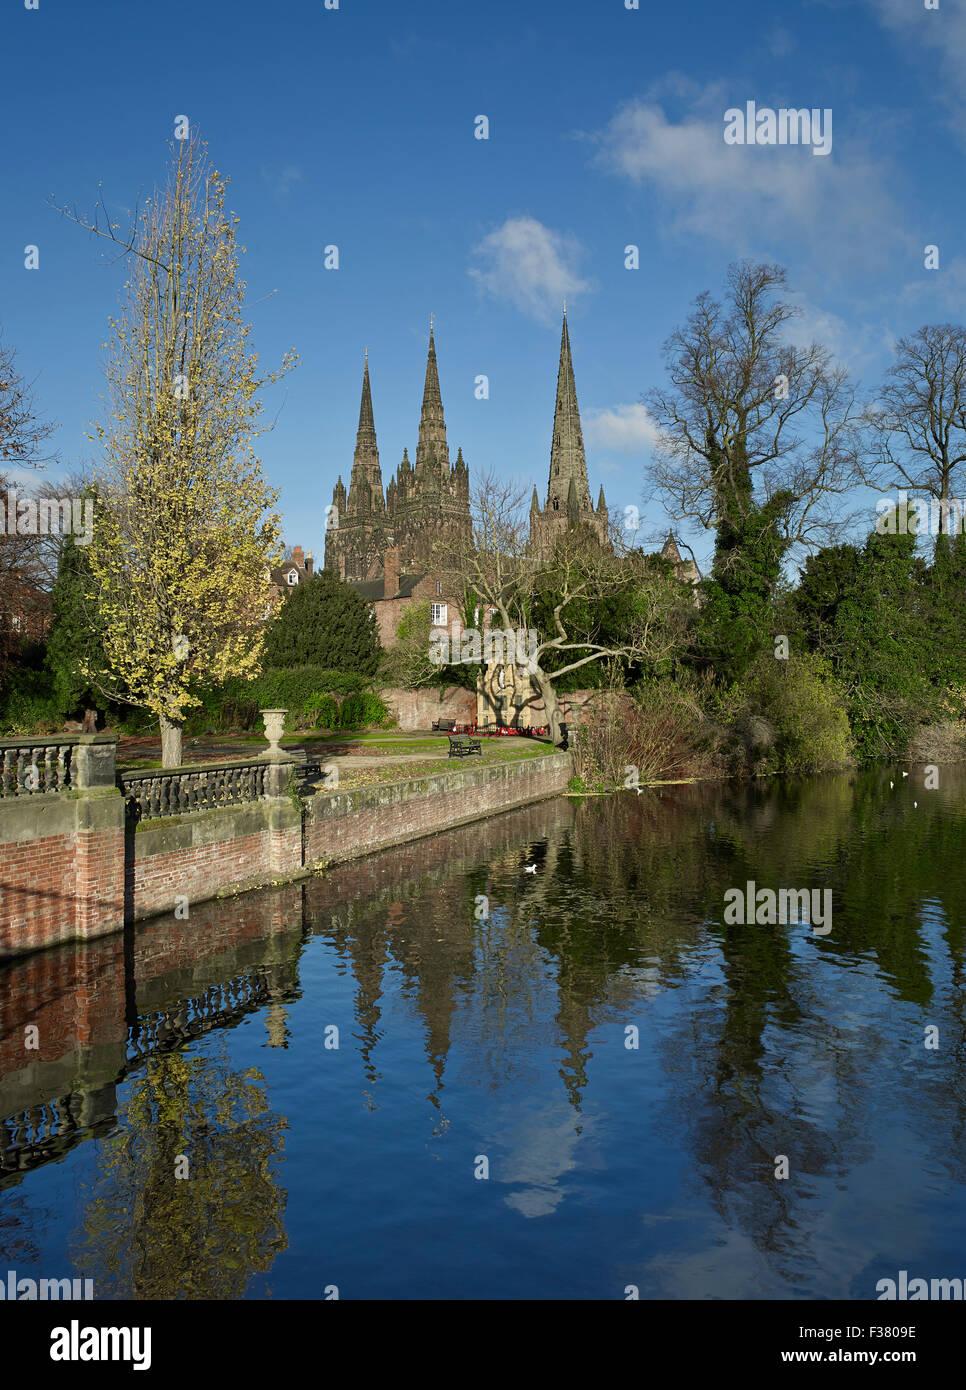 La Cathédrale de Lichfield trois spires Photo Stock